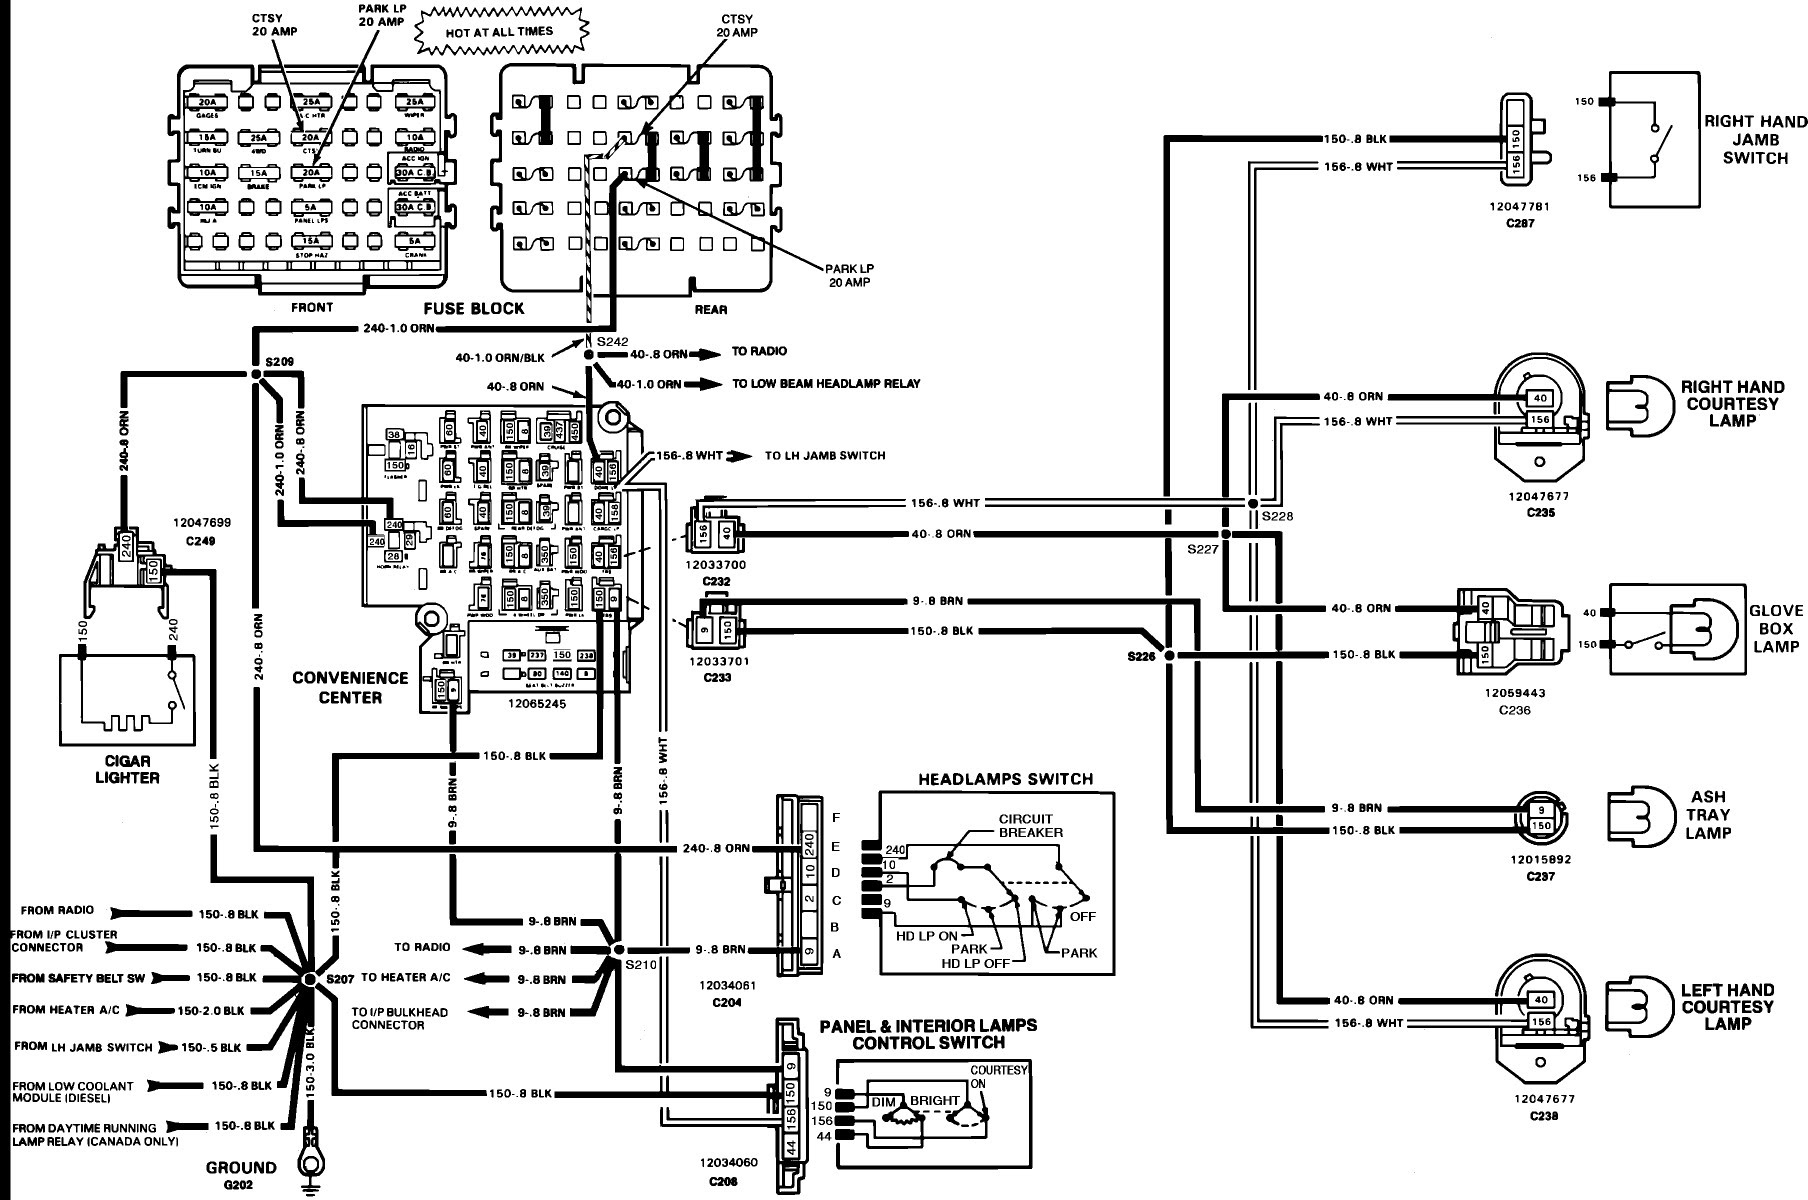 DIAGRAM] 1992 Chevy Kodiak Gmc Topkick And P6 Wiring Diagram Original FULL  Version HD Quality Diagram Original - KATANADIAGRAM.ONESKIN.FRDiagram Database - OneSkin.fr